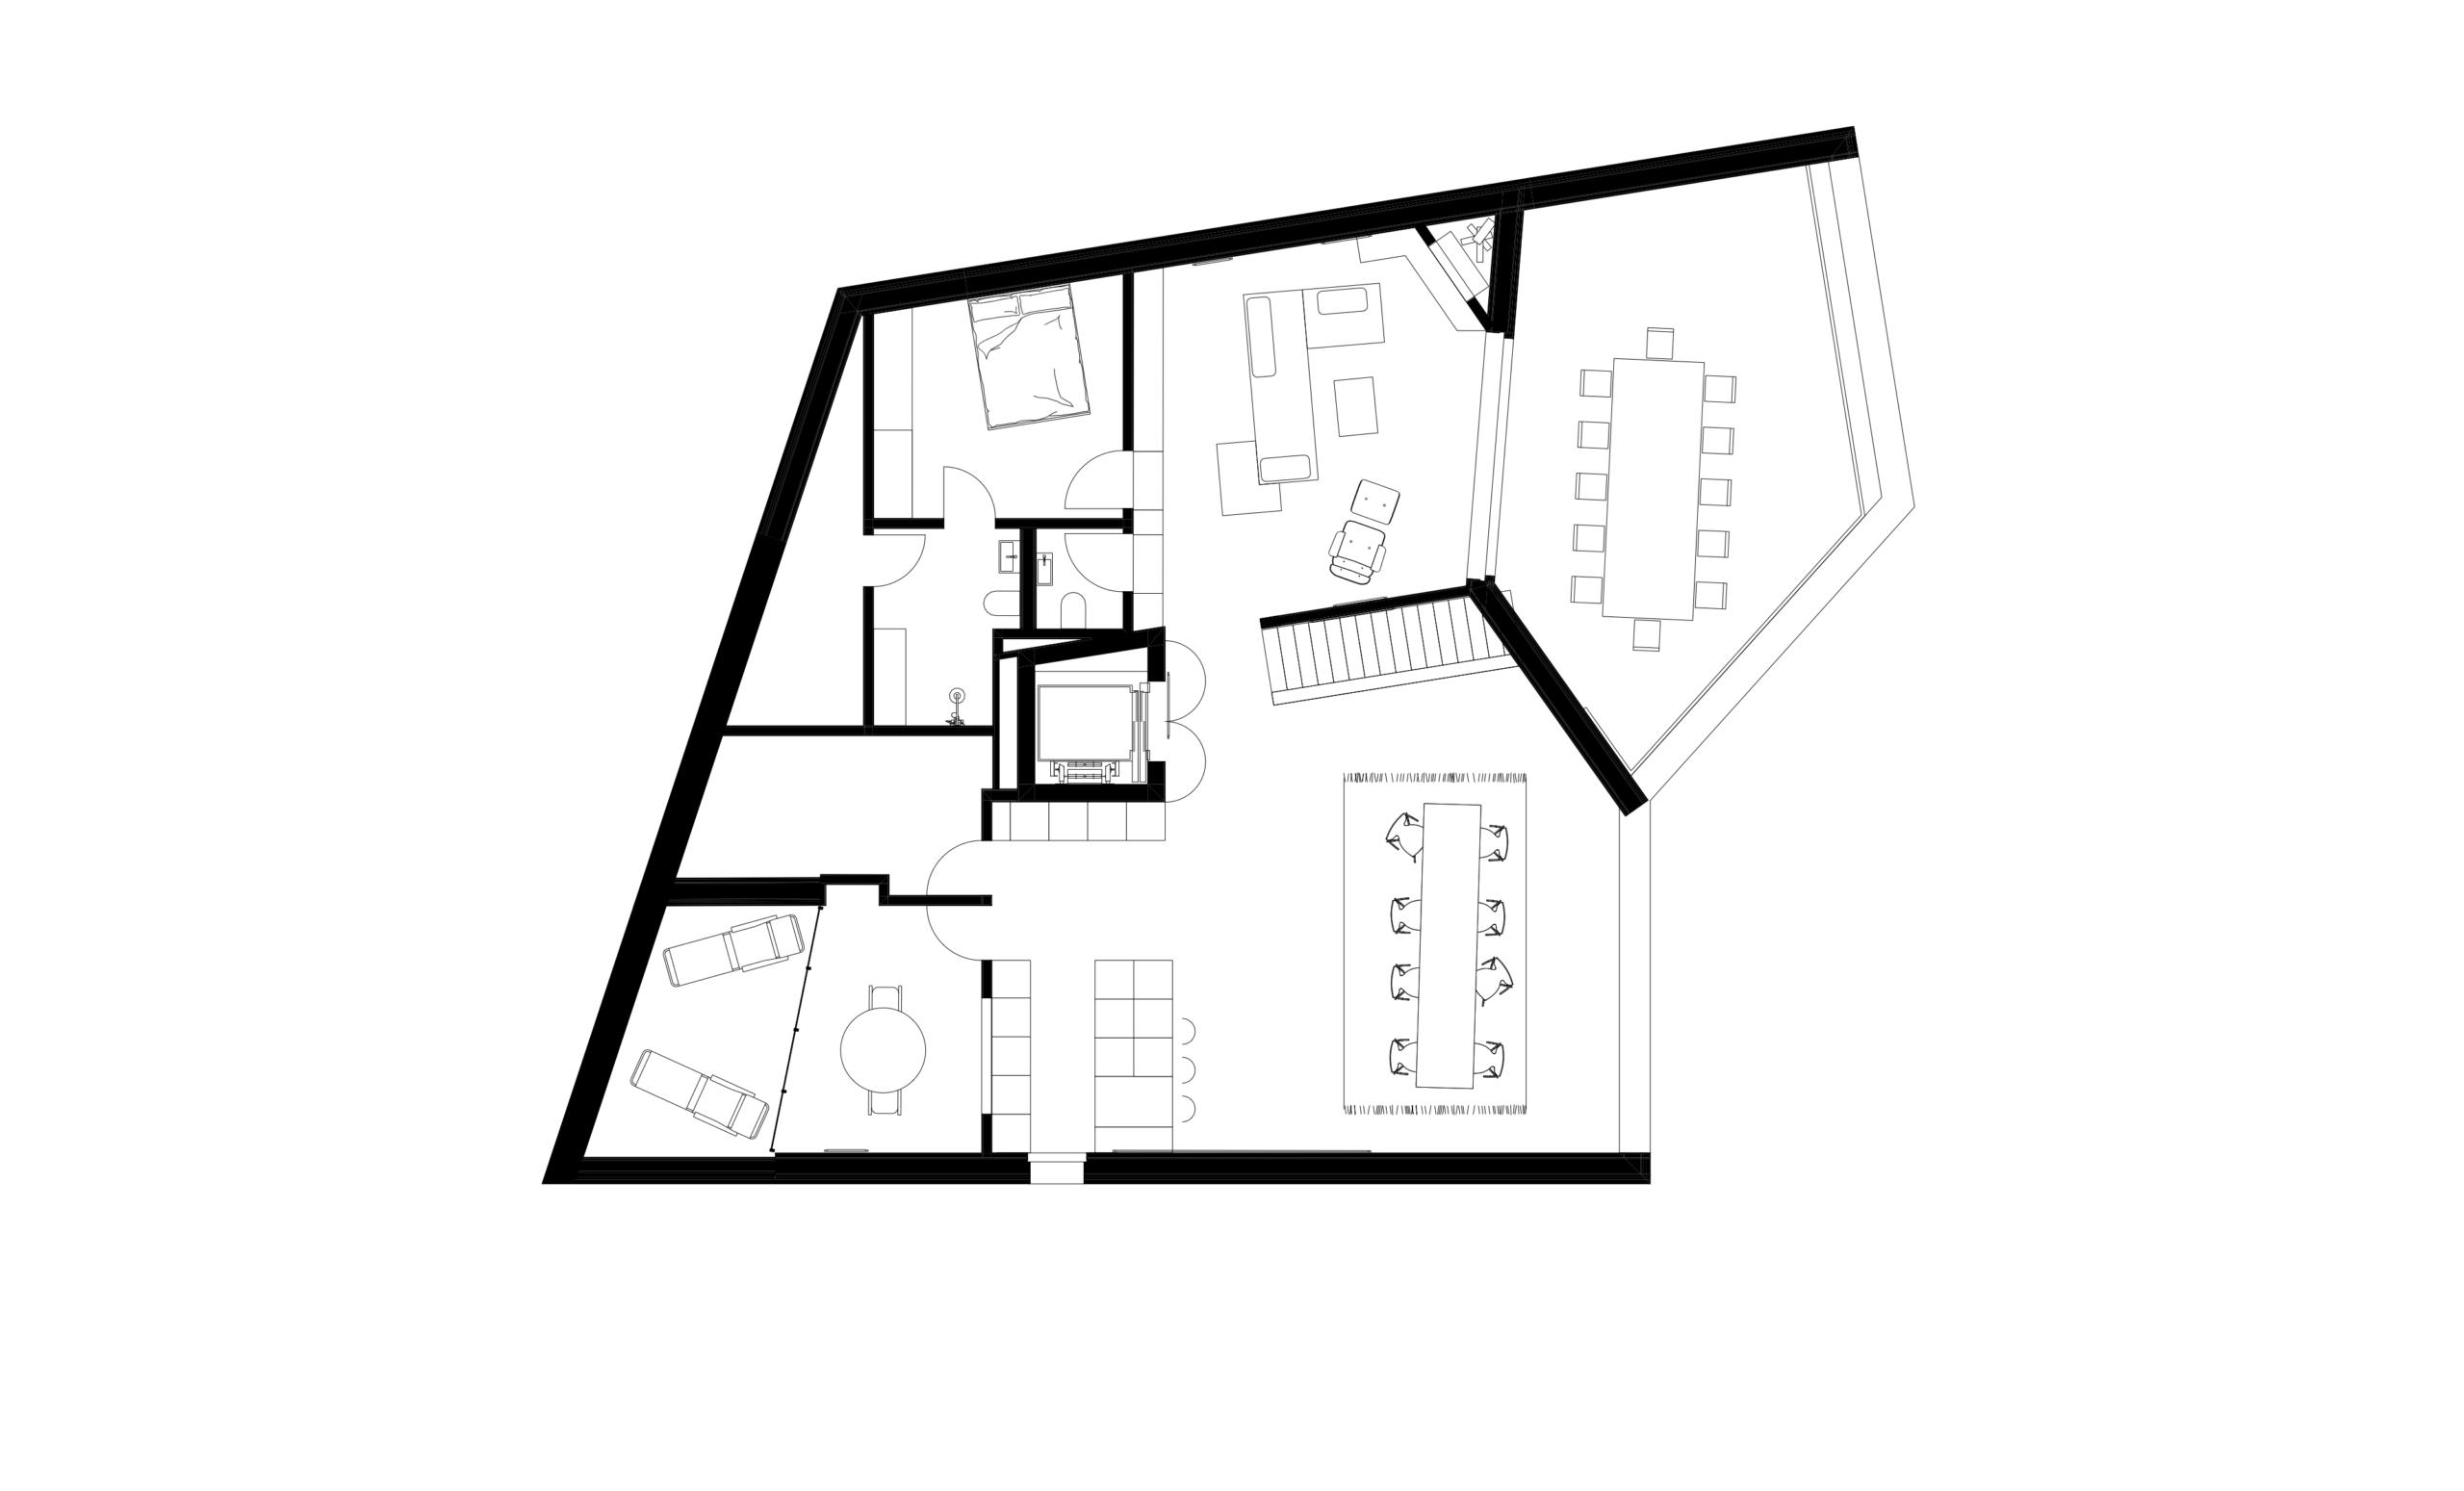 DG Mehrfamilienhaus Richterswil